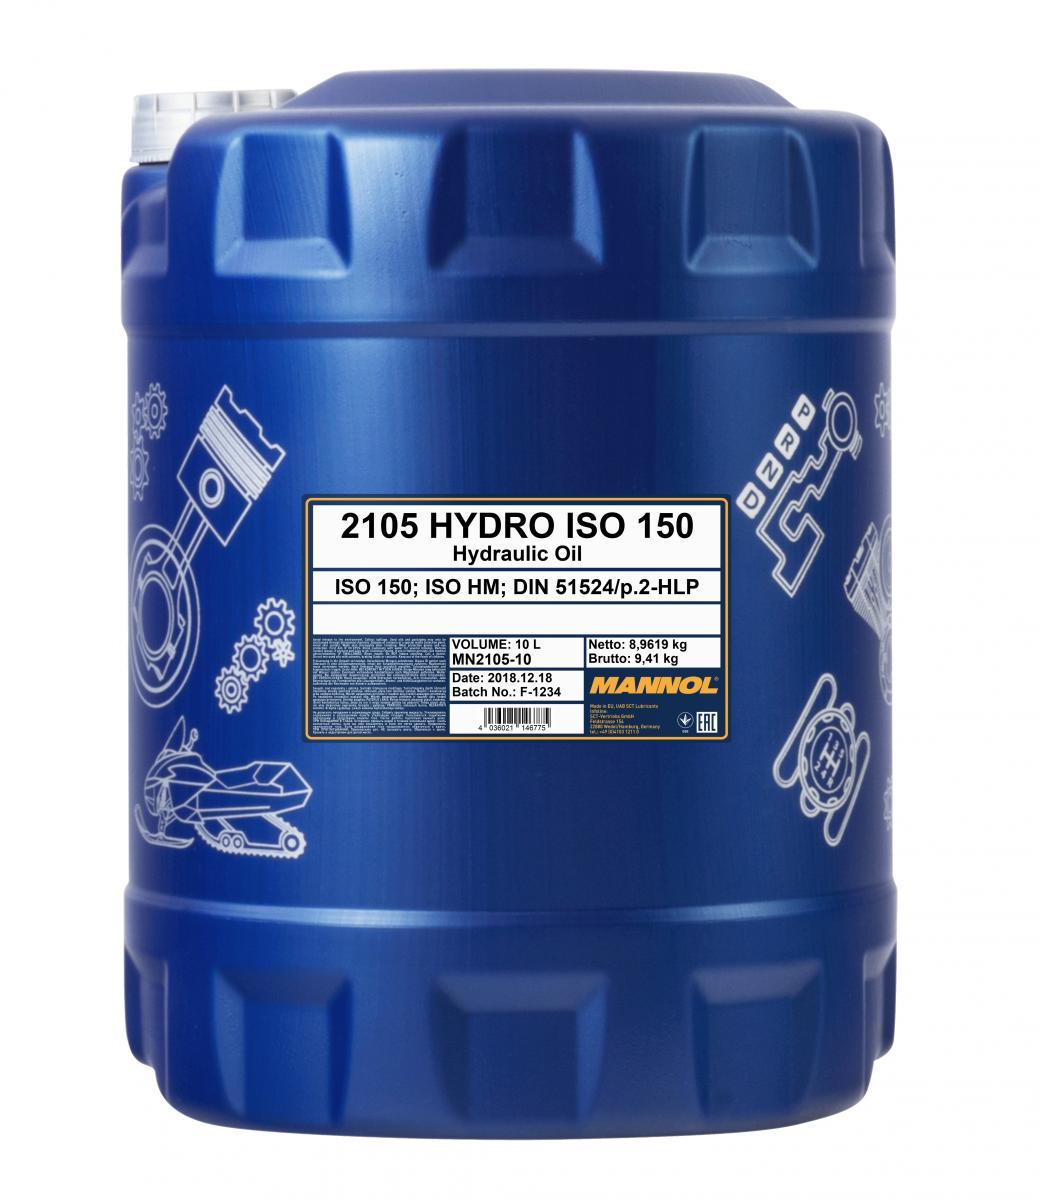 Hydro ISO 150